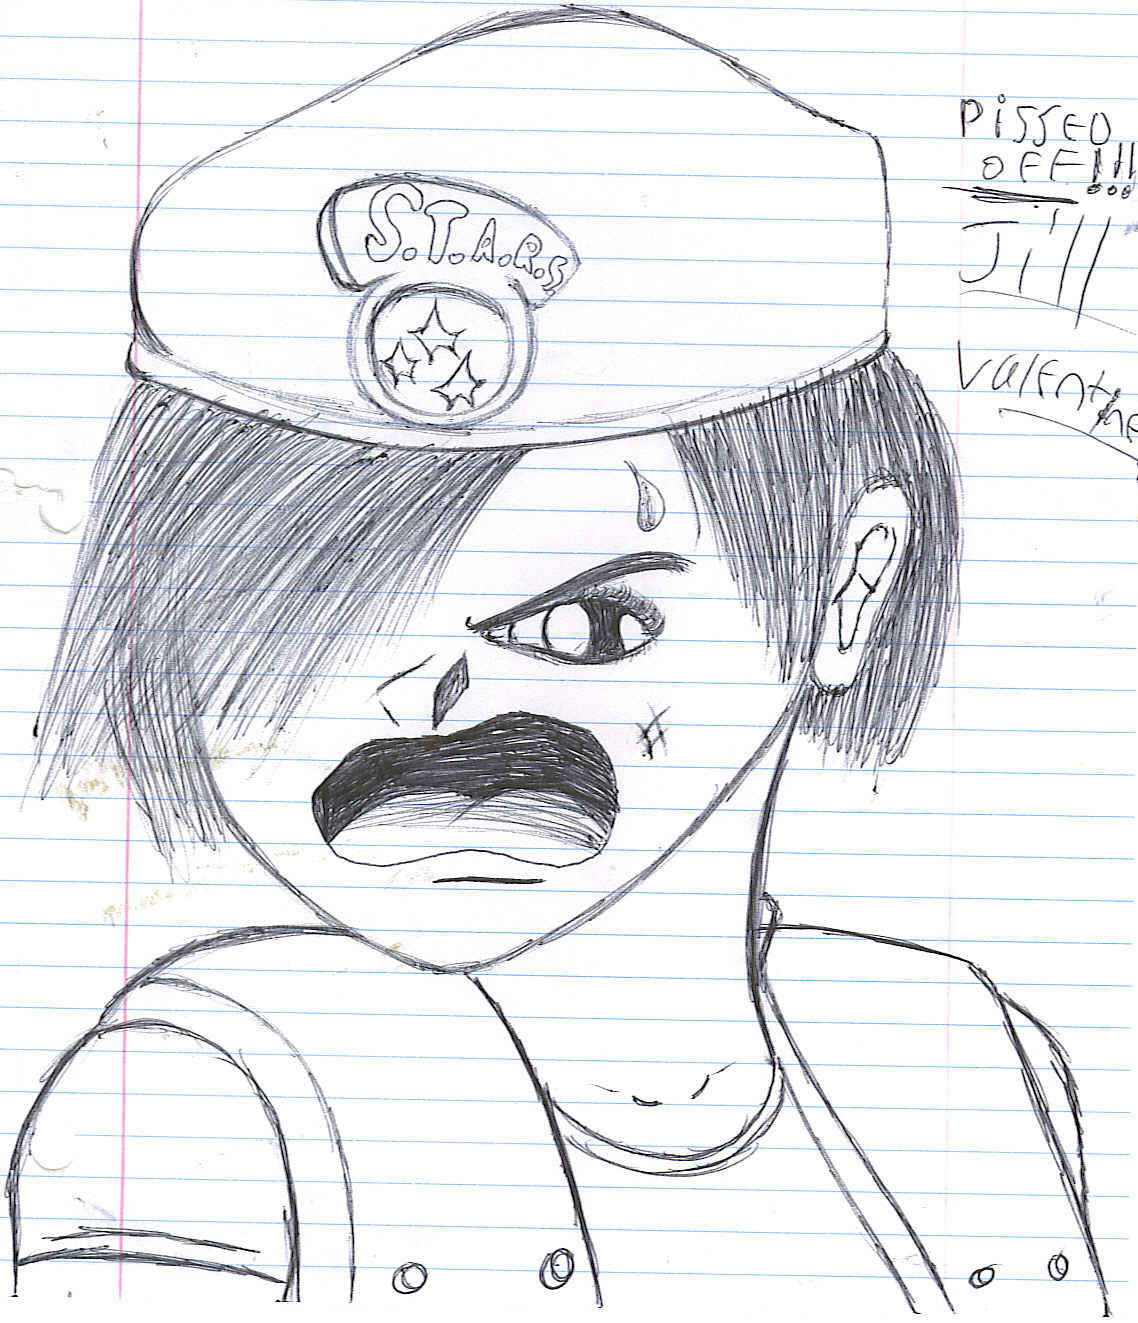 Pissed Off Jill(Chibi) by resident_evil_fan_